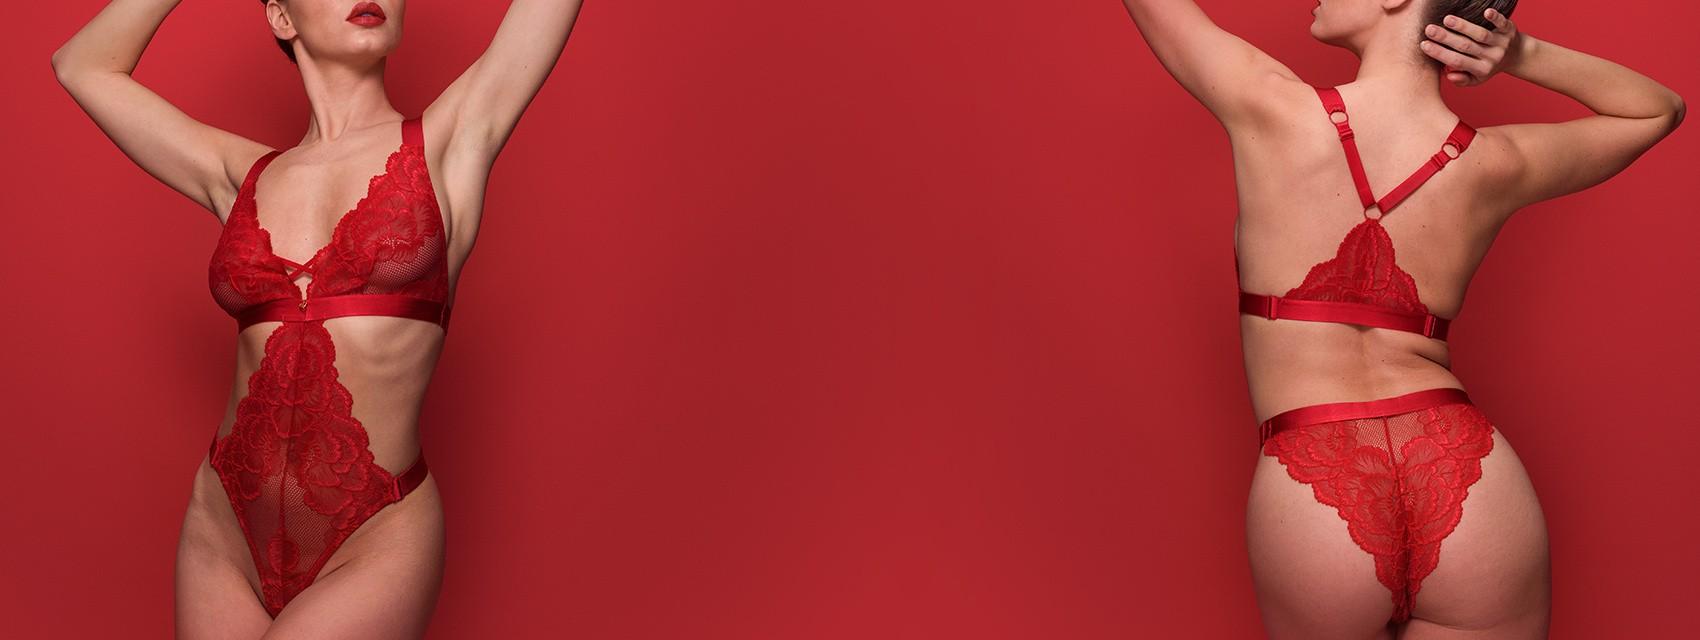 Val-Lingerie-Flatpage-Carousel-Desktop-Beau-Lace-Body